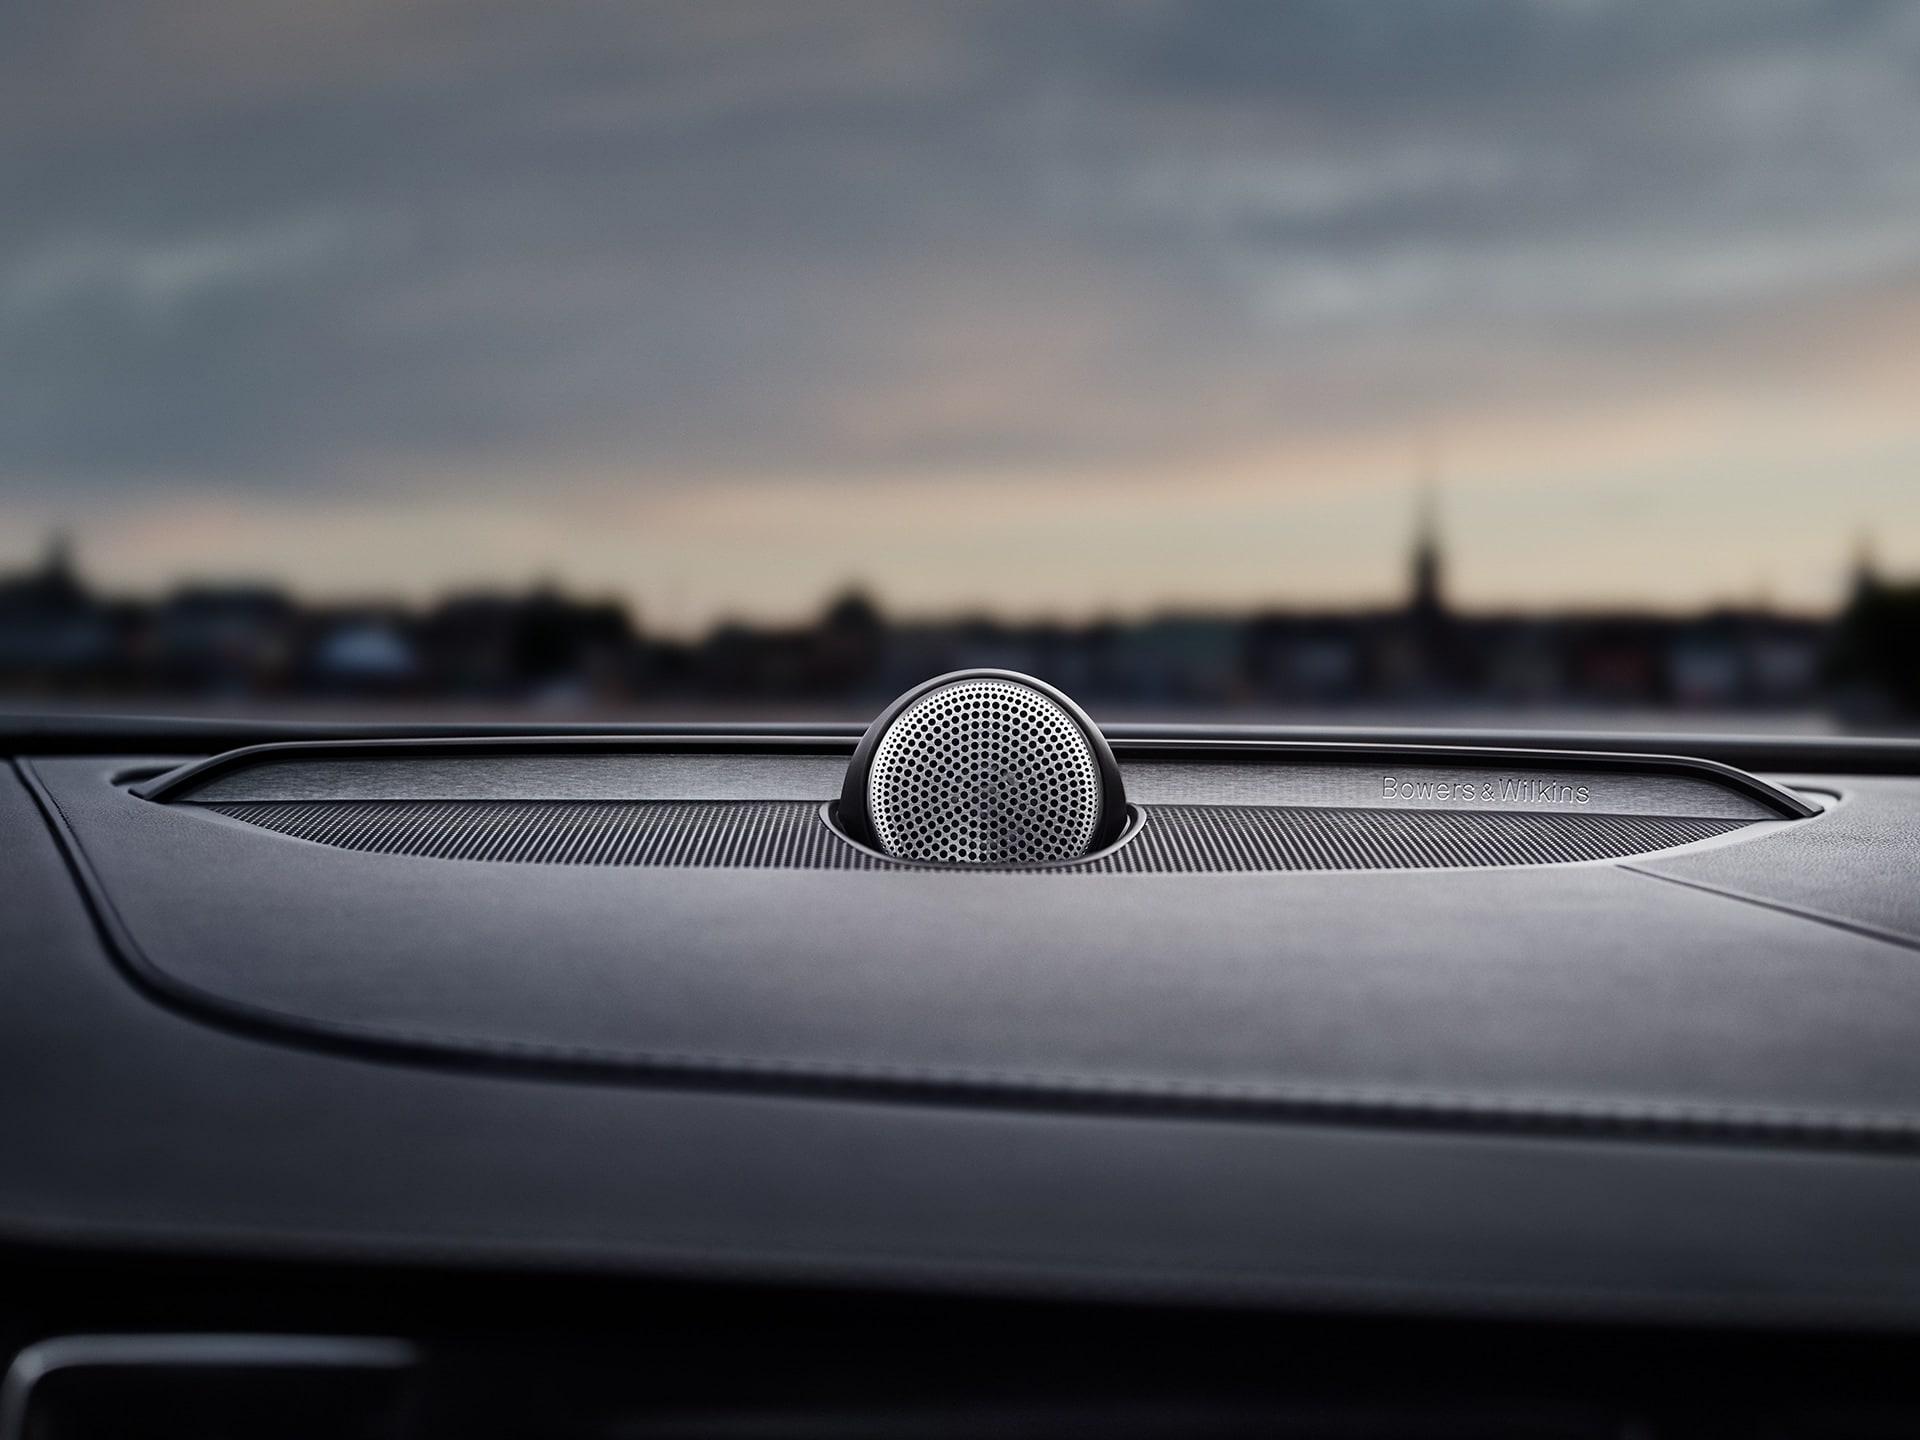 Bowers & Wilkins-högtalare i en Volvo XC90 Recharge.